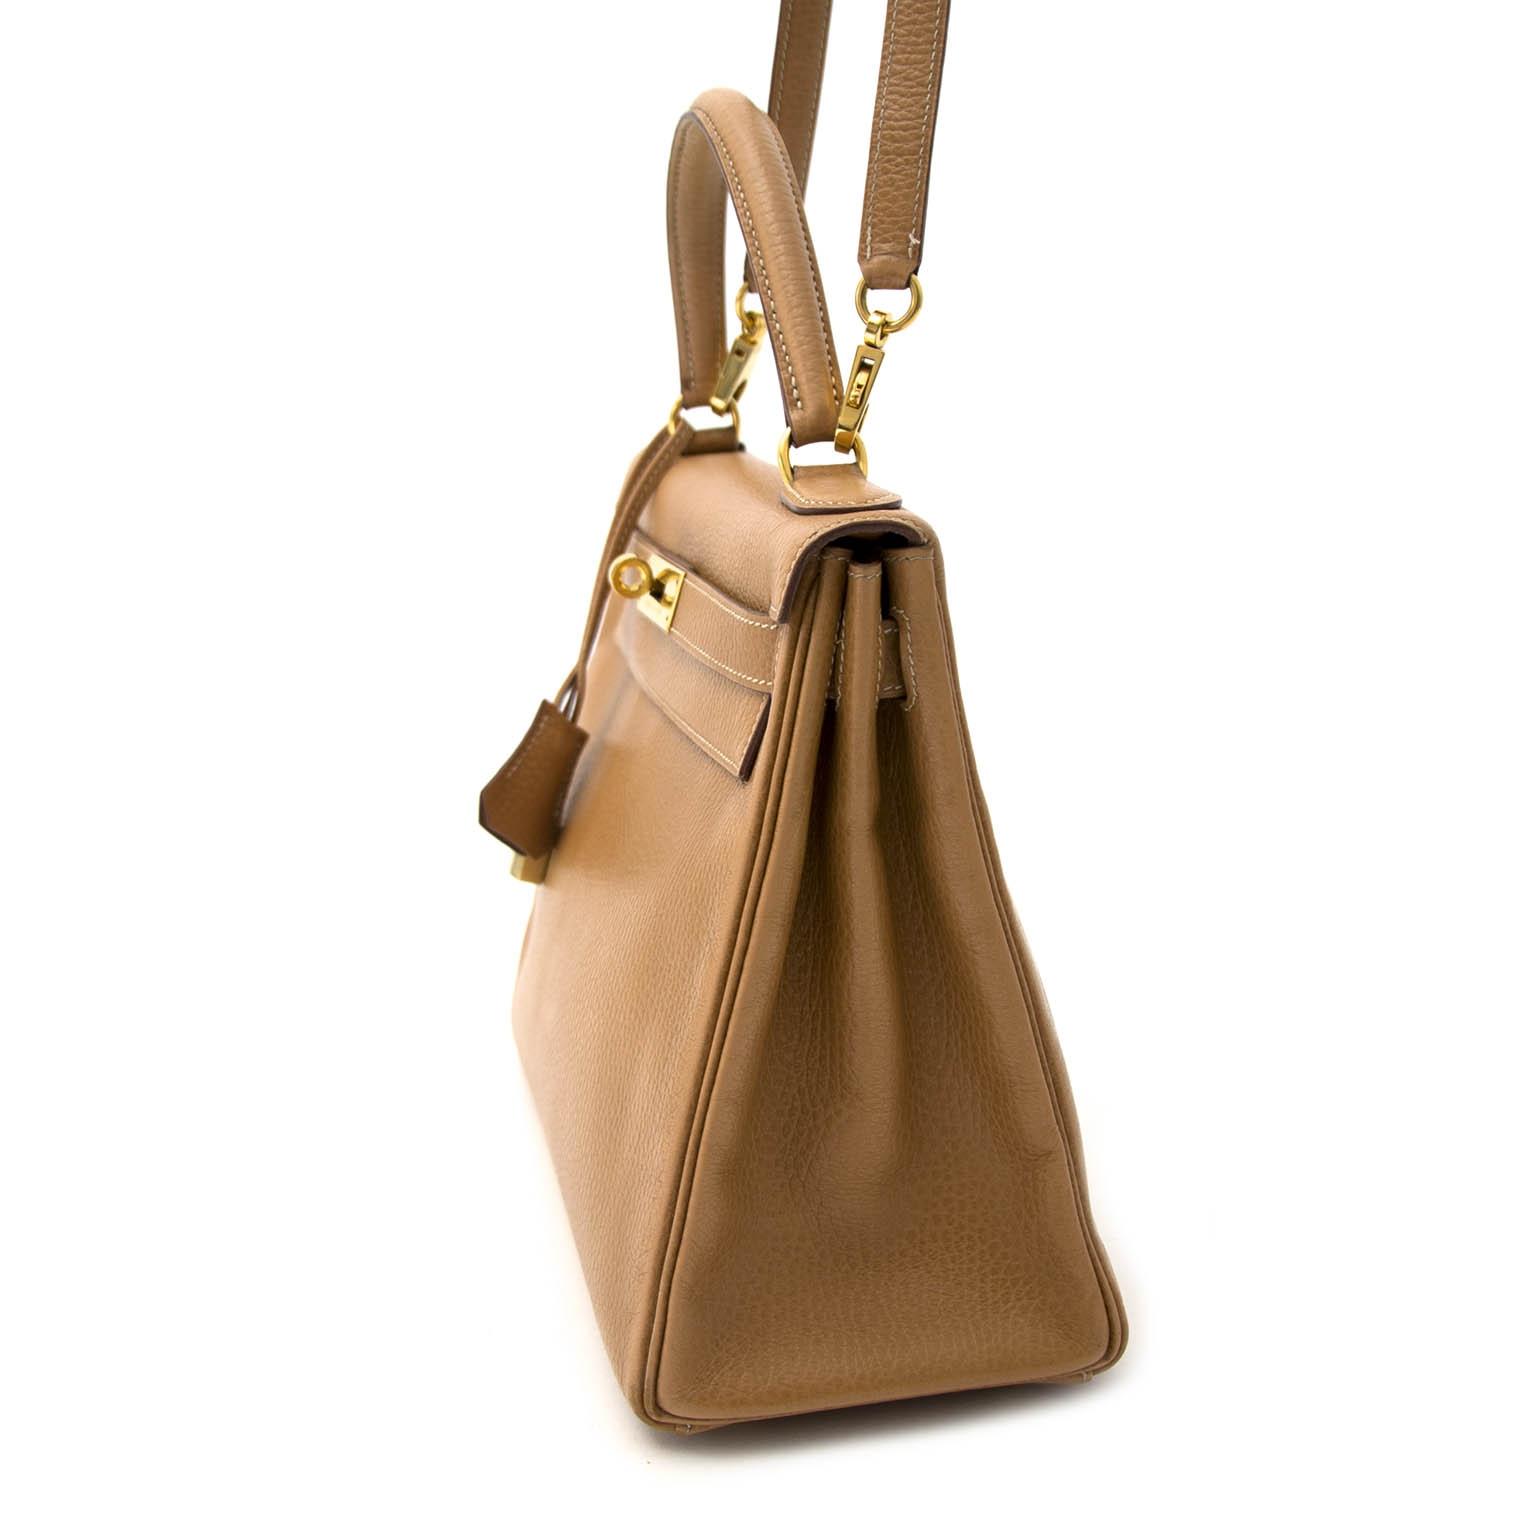 acheter en ligne seconde main Hermès Caramel Kelly 28  Fache Liegee GHW